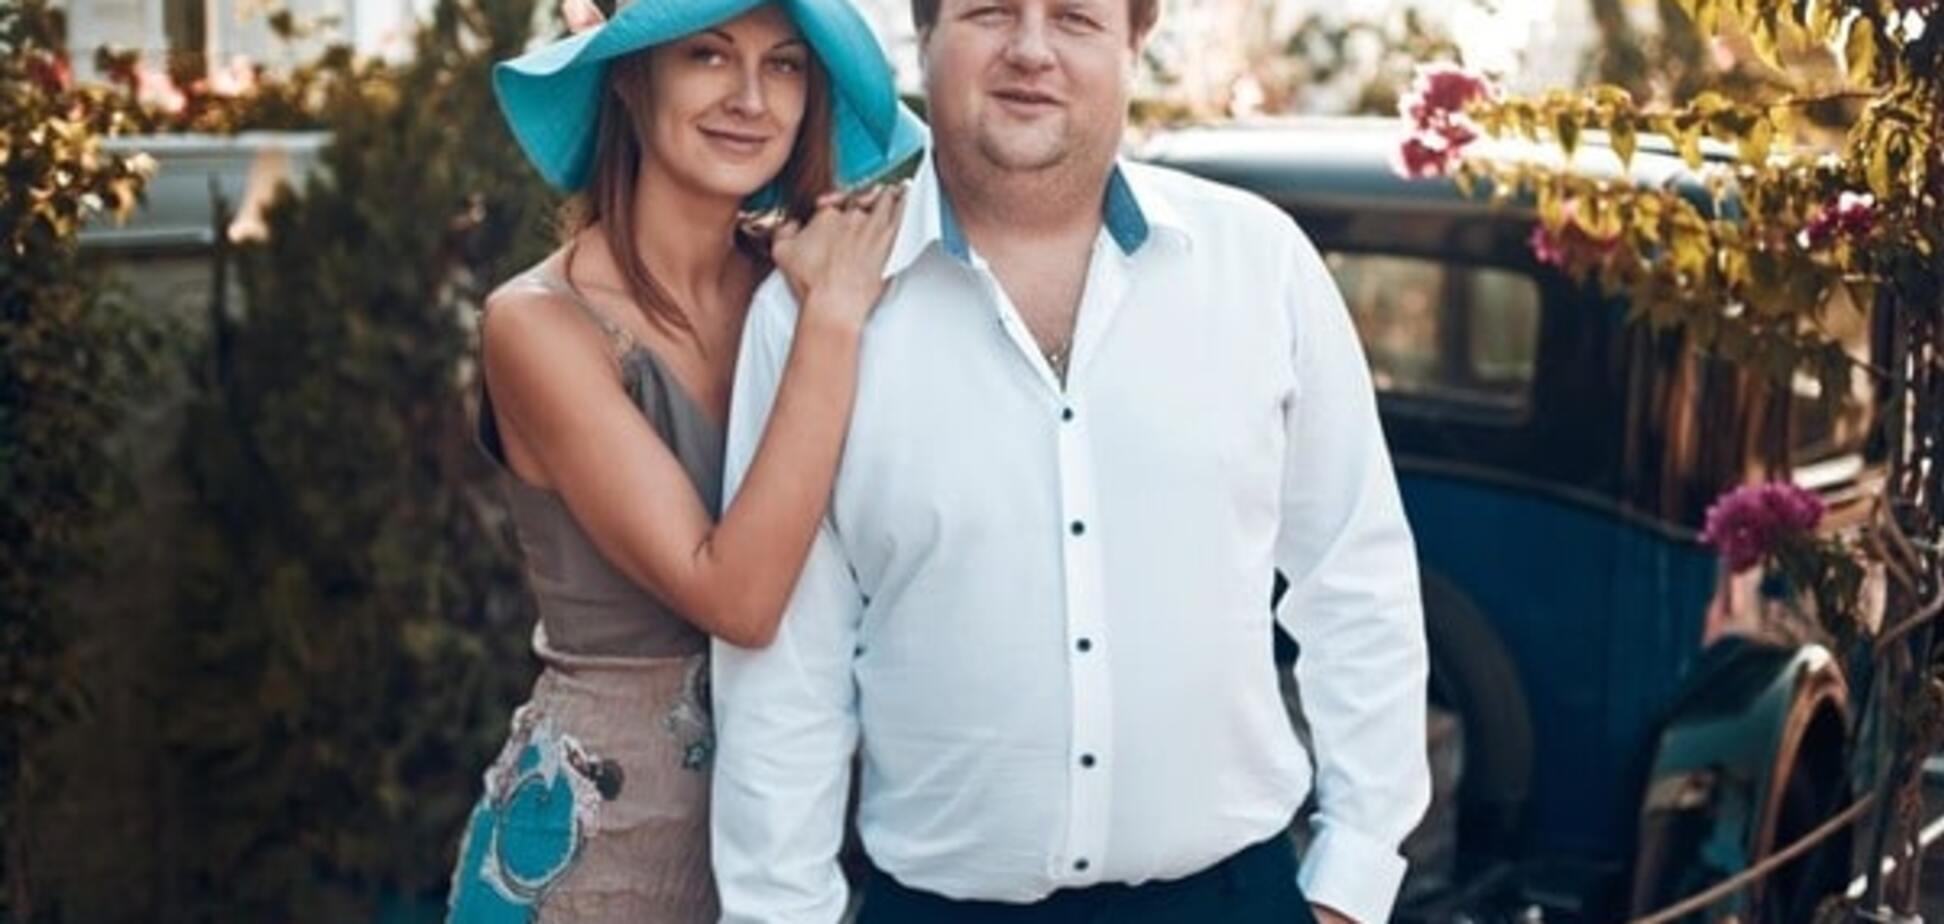 Виктор Бронюк откровенно о романтике, жене и Украине